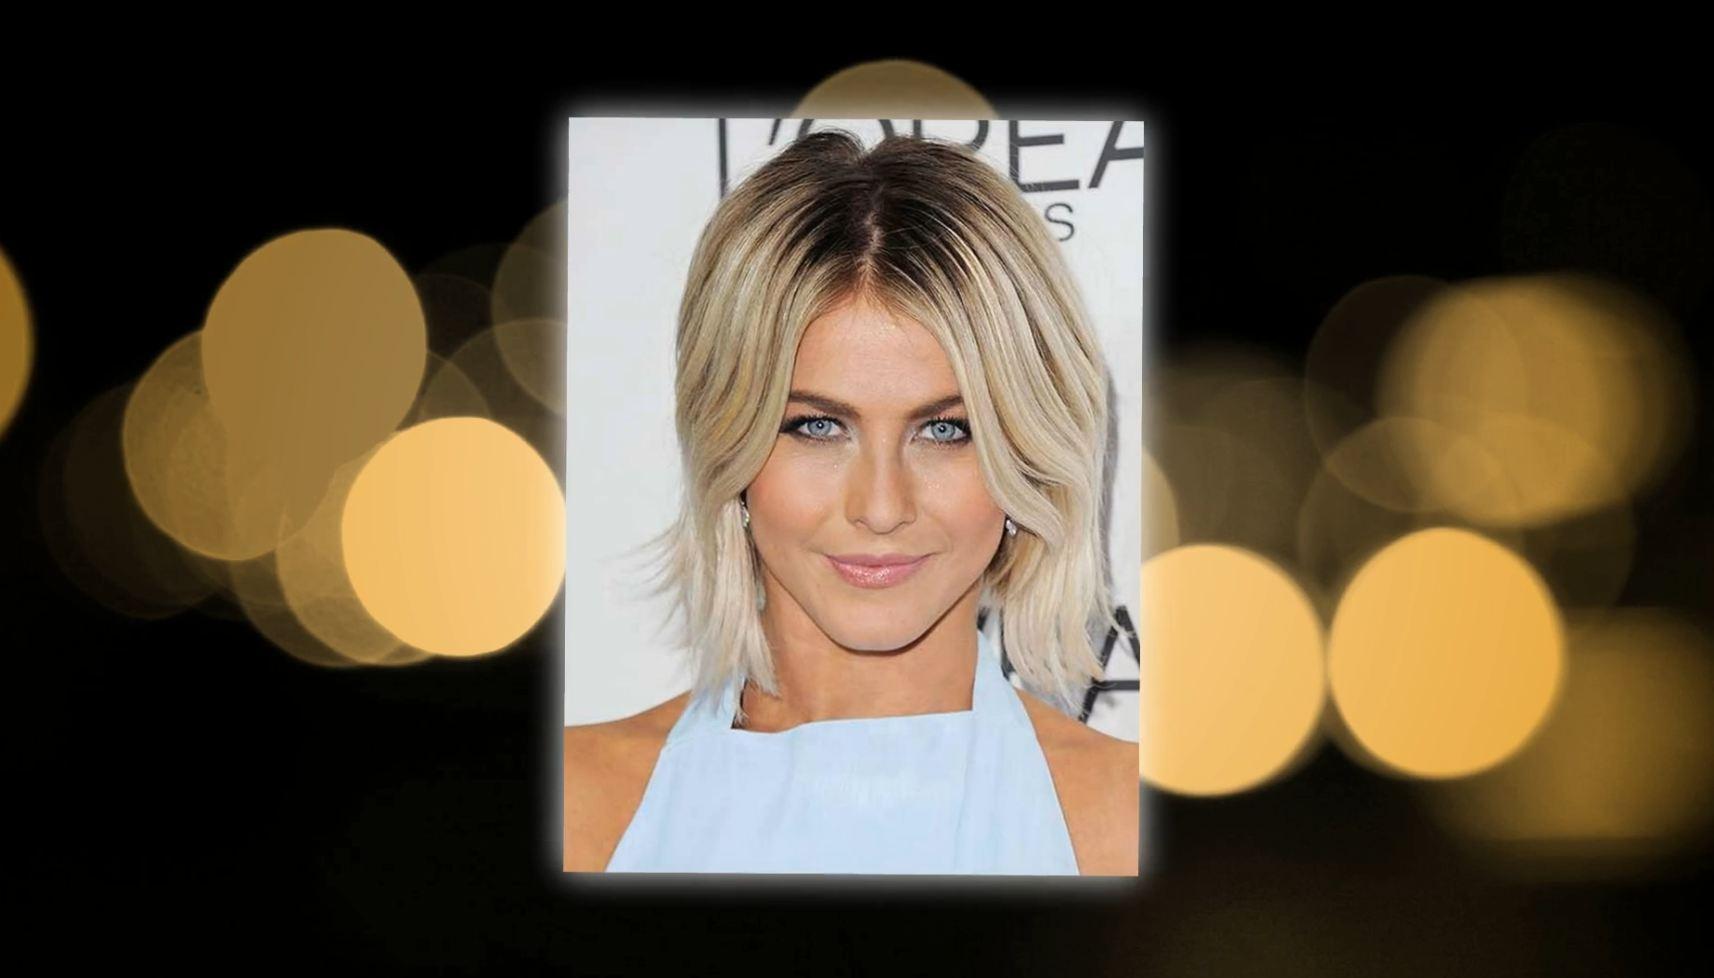 Bob Hairstyles & Haircuts for 2018